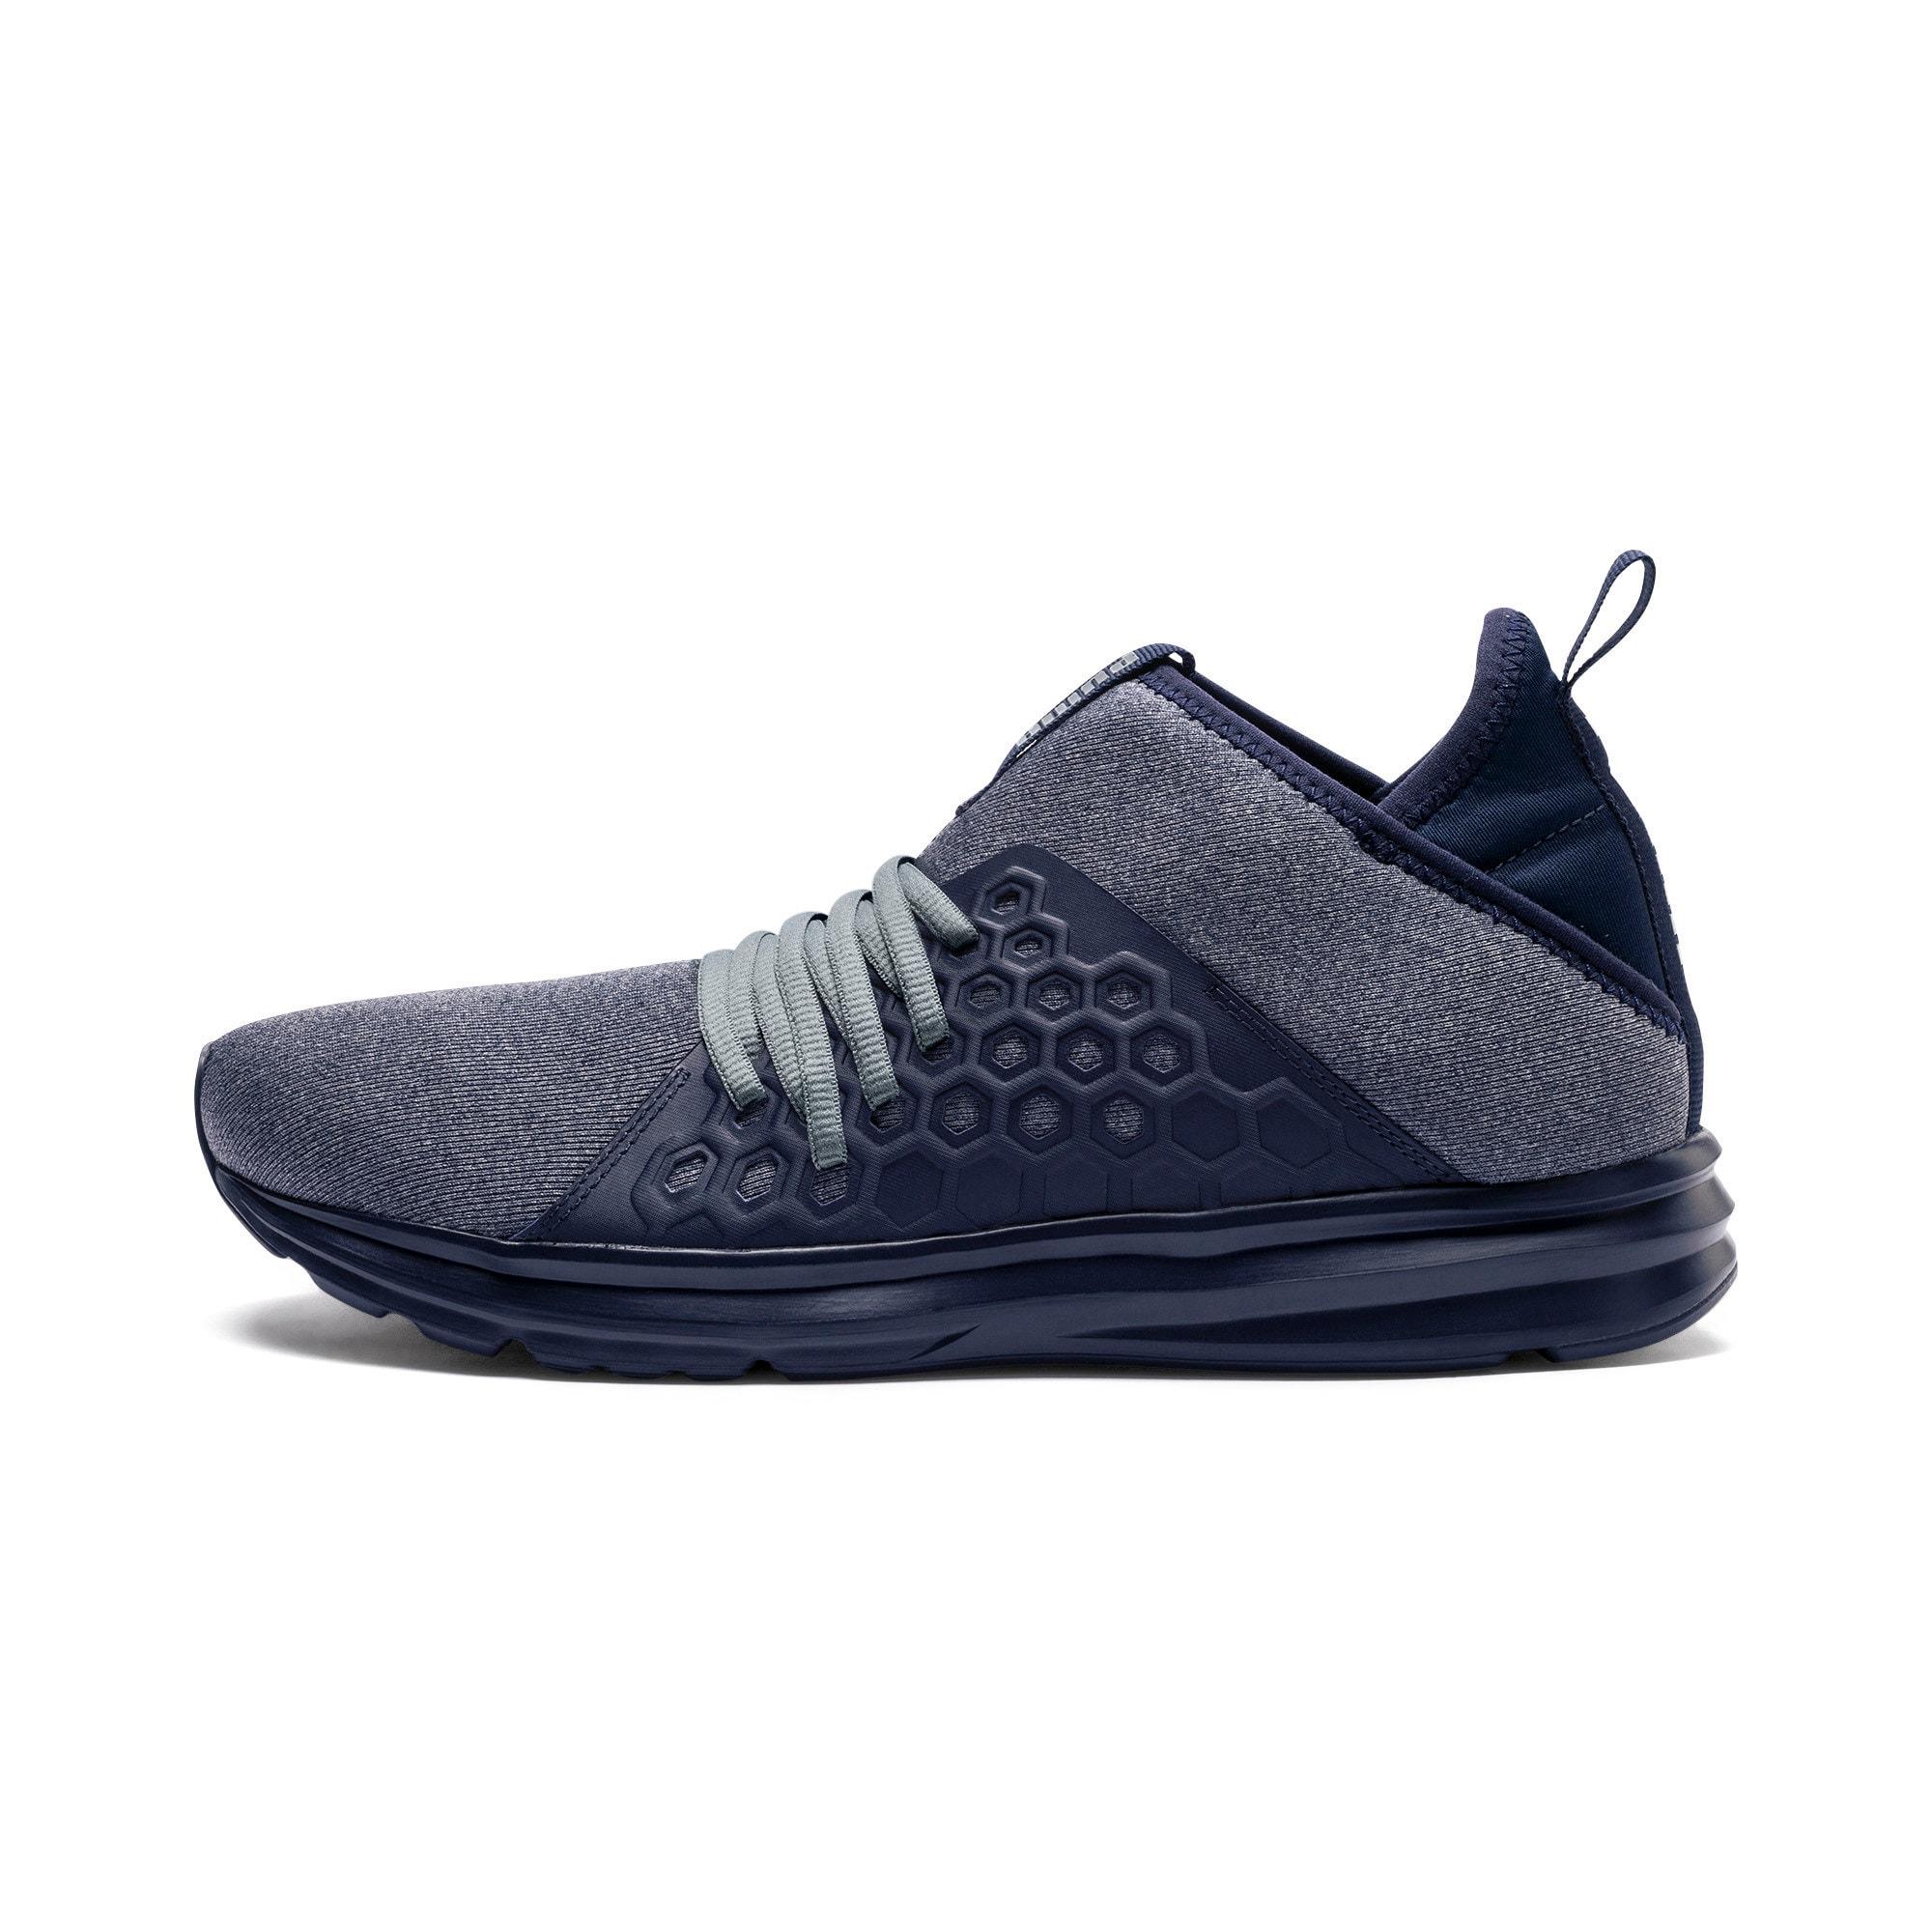 Thumbnail 1 of Enzo NF Mid Men's Training Shoes, Peacoat-Quarry, medium